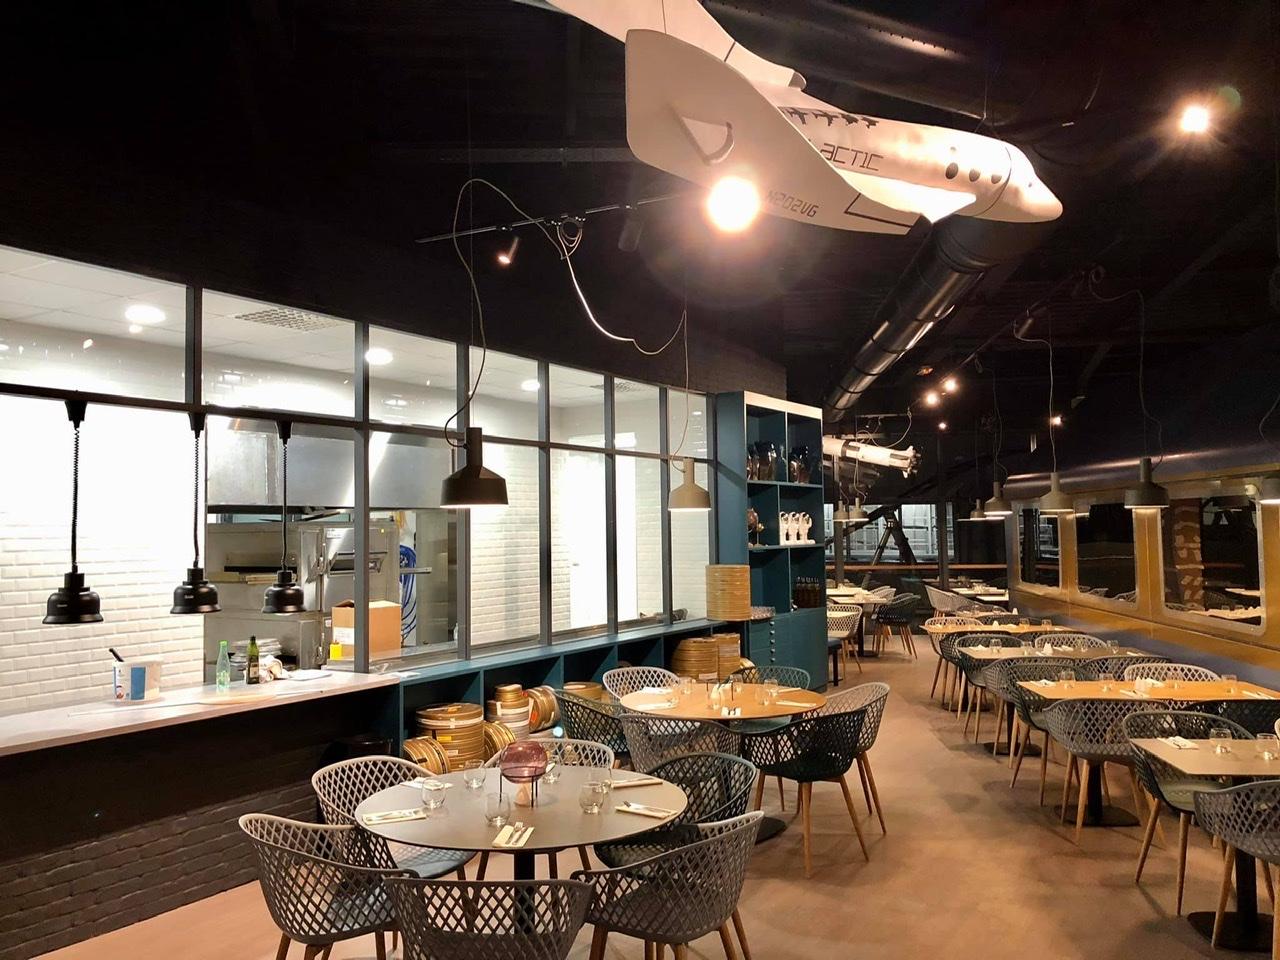 atelier - [Restaurant] L'Atelier des Saveurs · 2020 7-AD3-B781-E371-4-DA6-A880-9-A3-A1-A9259-CA